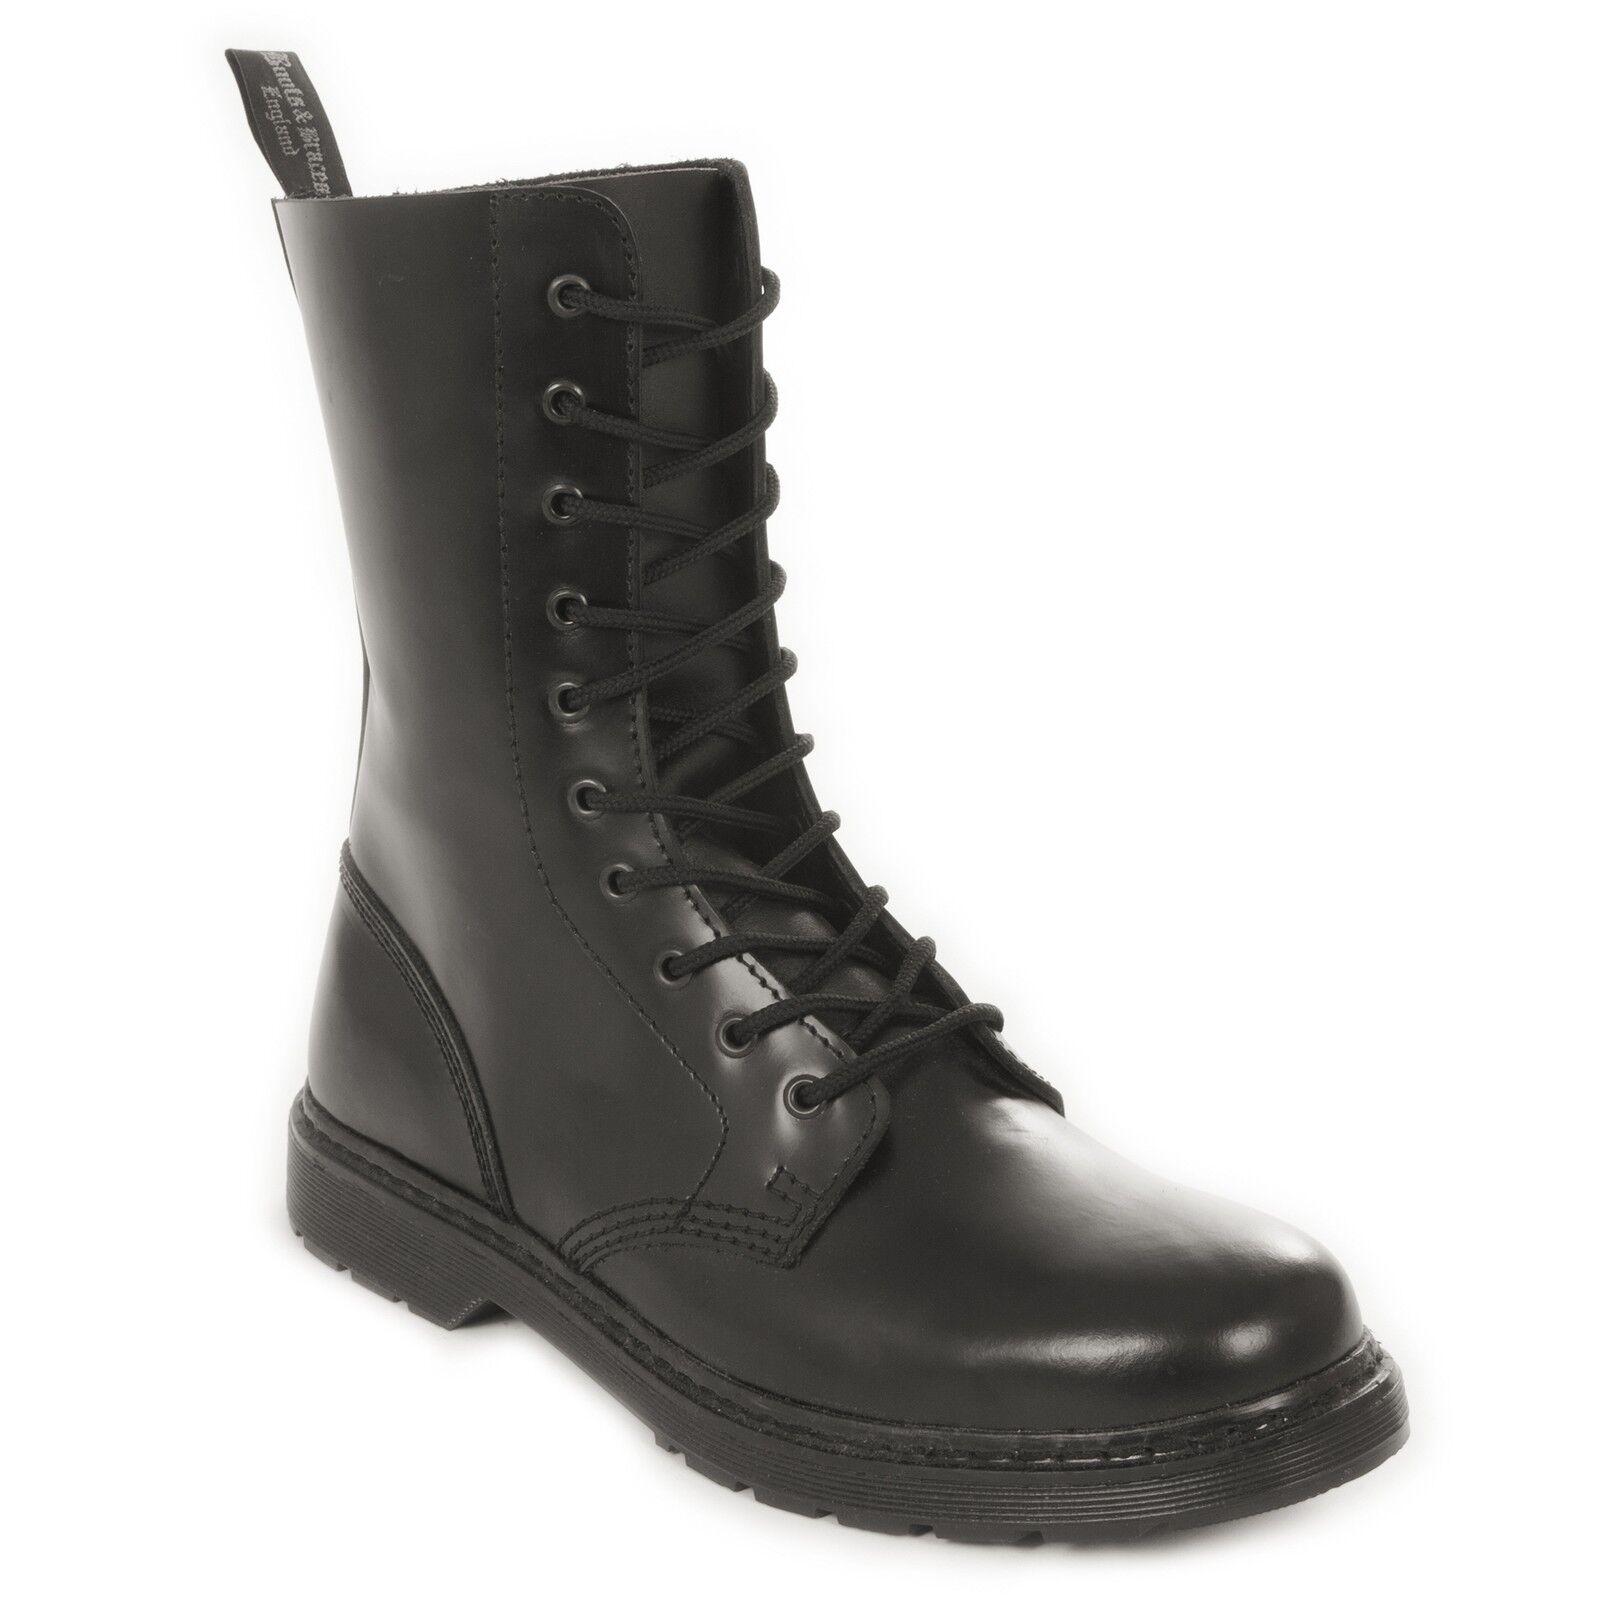 Boots & Braces - easy 10 Loch monochrom Black on Black Stiefel Rangers Schwarz